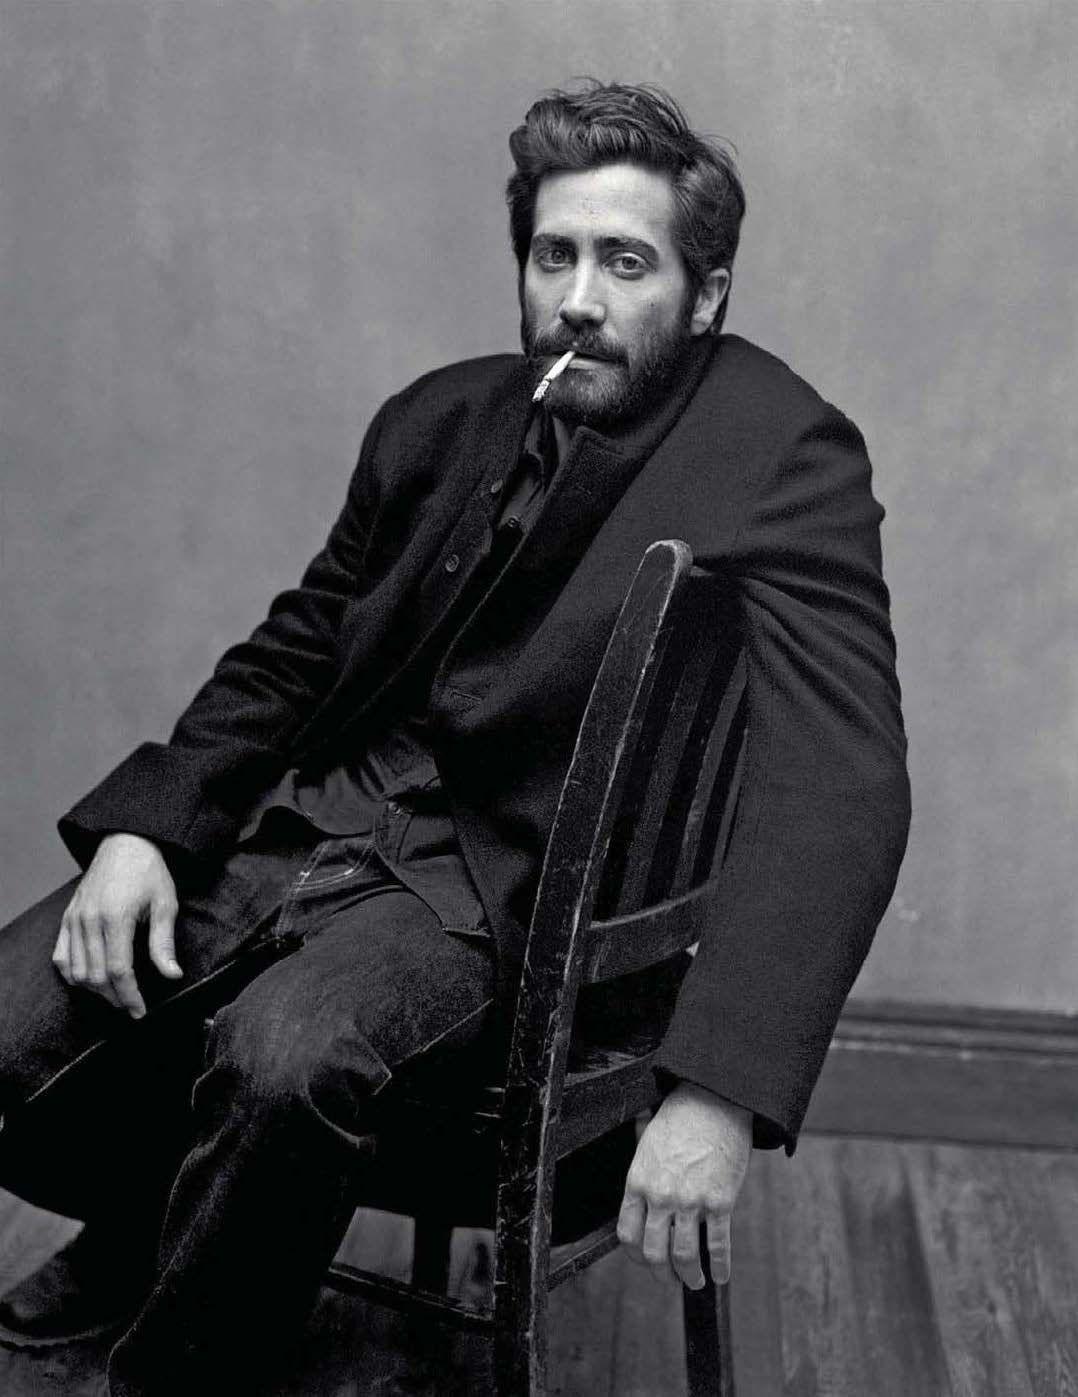 𝐬𝐨𝐟𝐢𝐚 | Portrait photography men, Jake gyllenhaal, Gq style